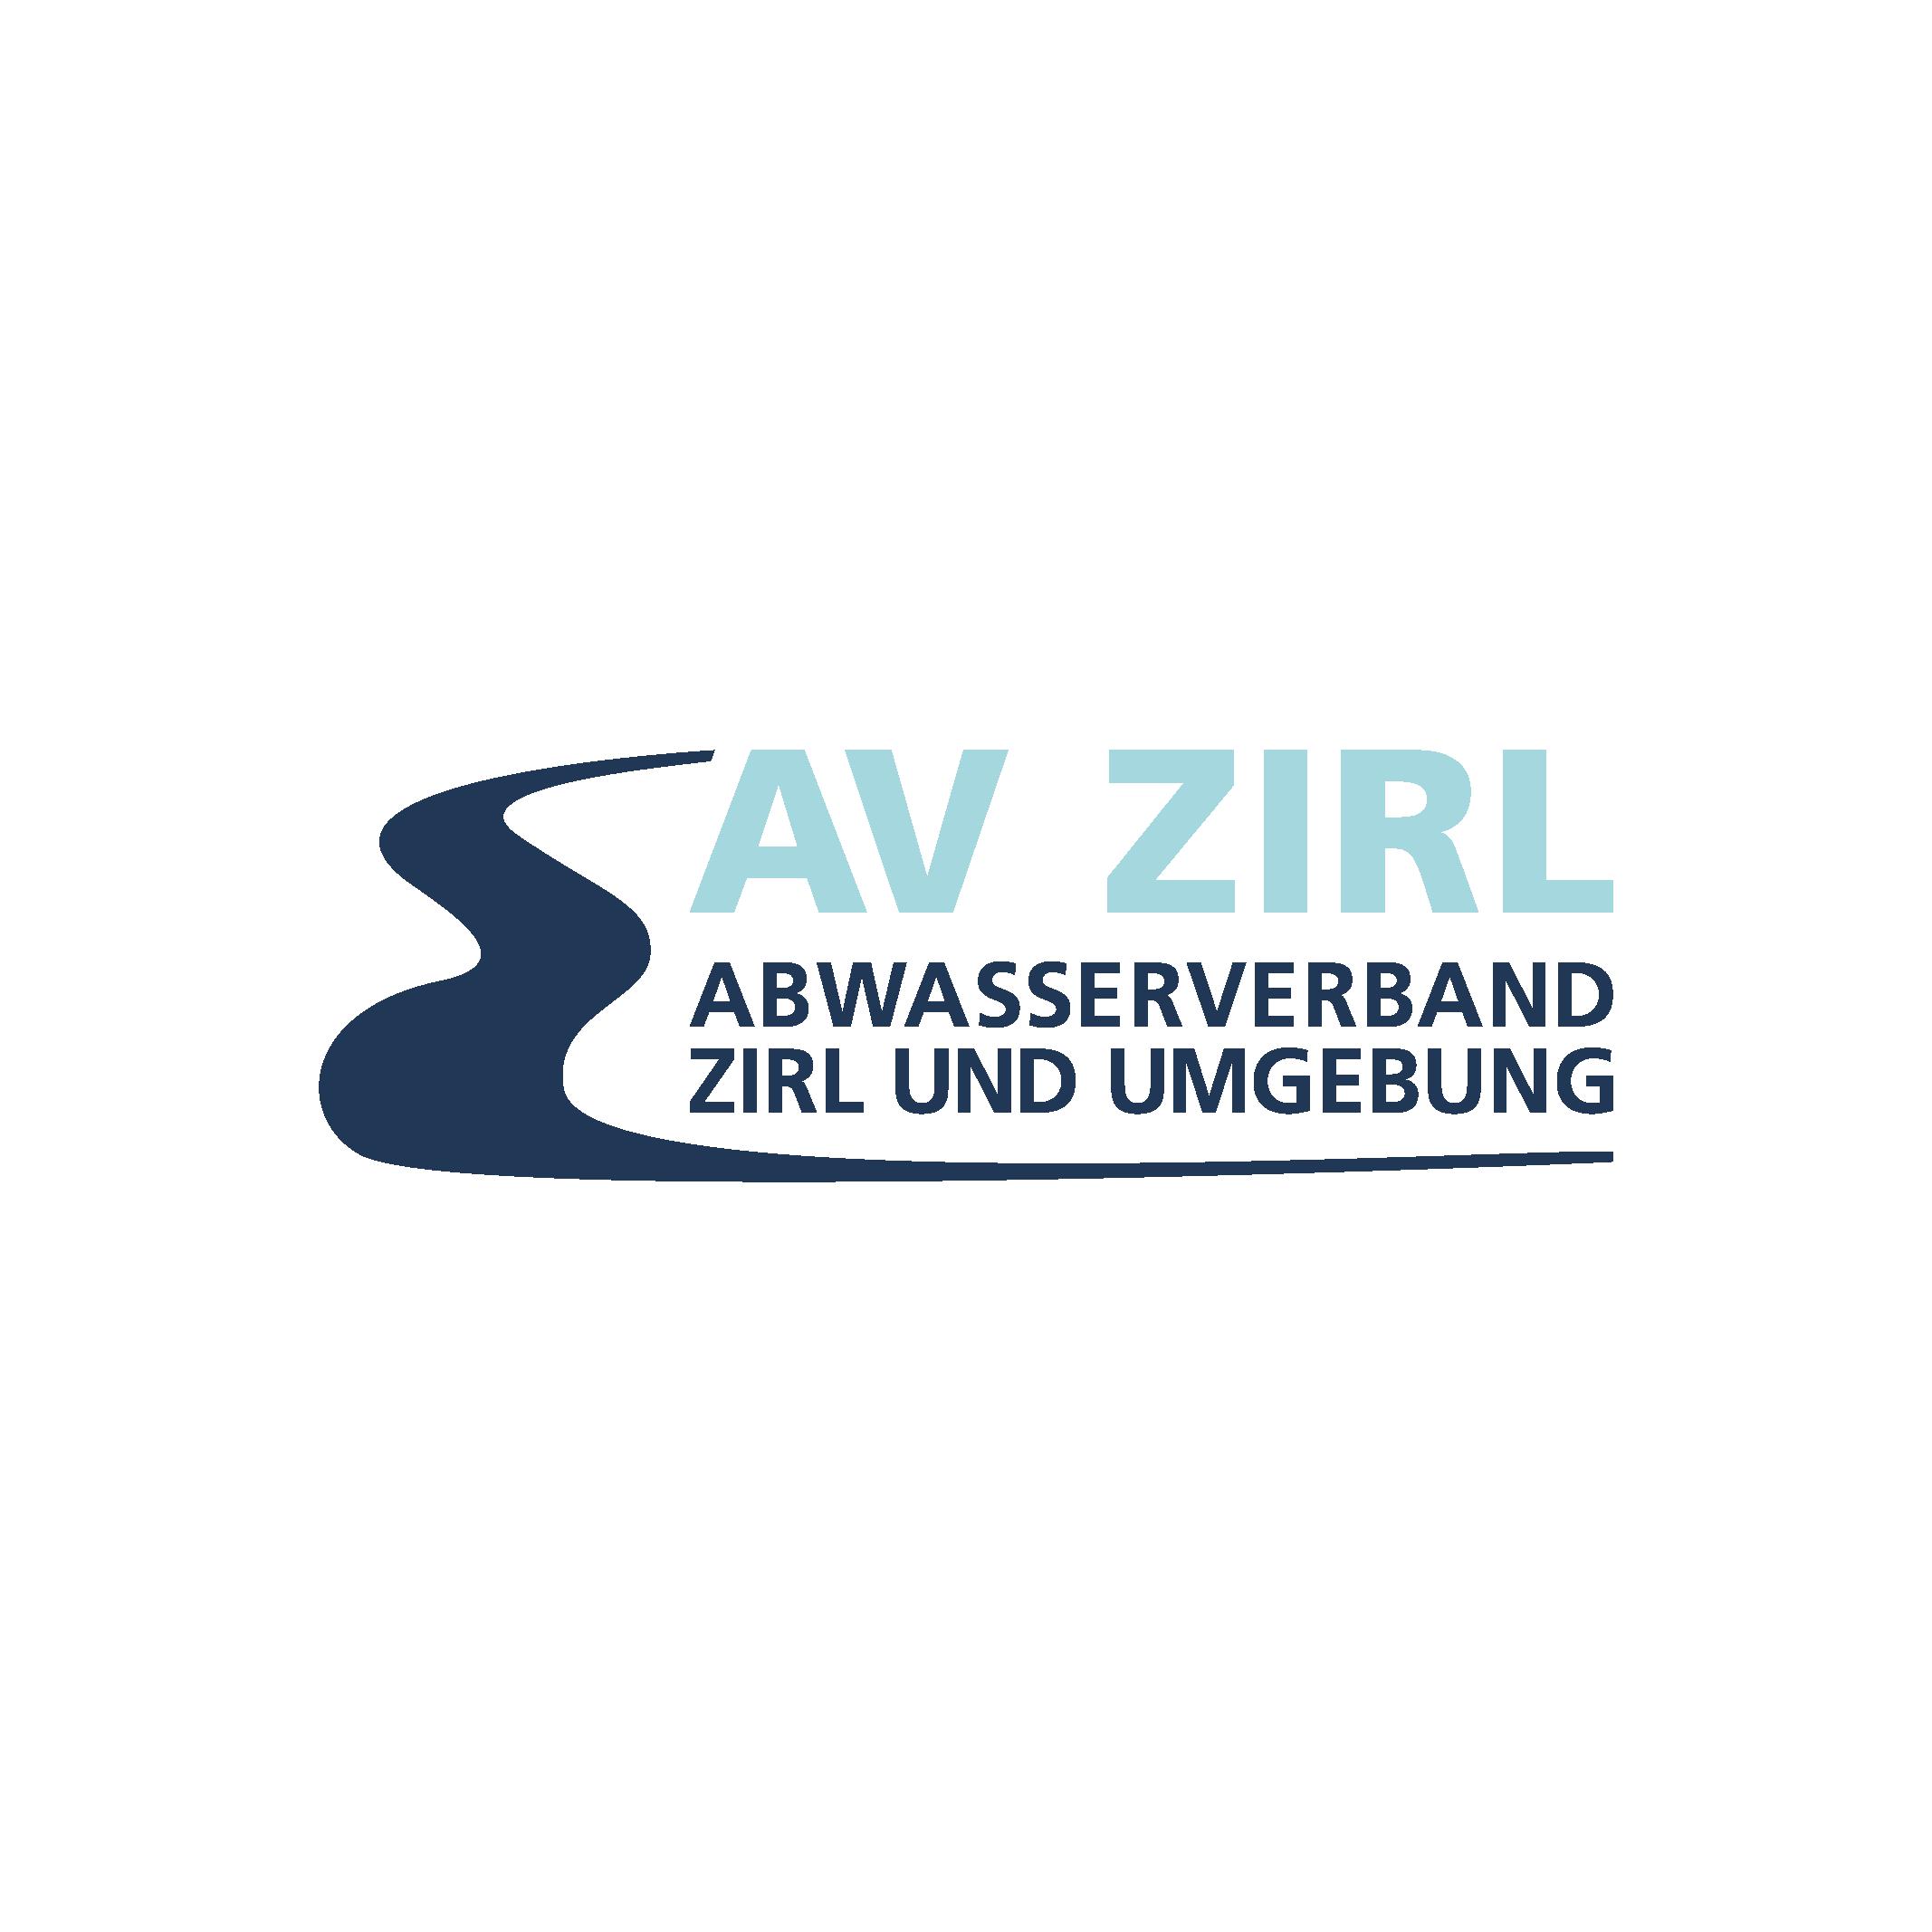 https://www.influxmediahouse.com/wp-content/uploads/2019/01/Logo_AVZ-colour.png